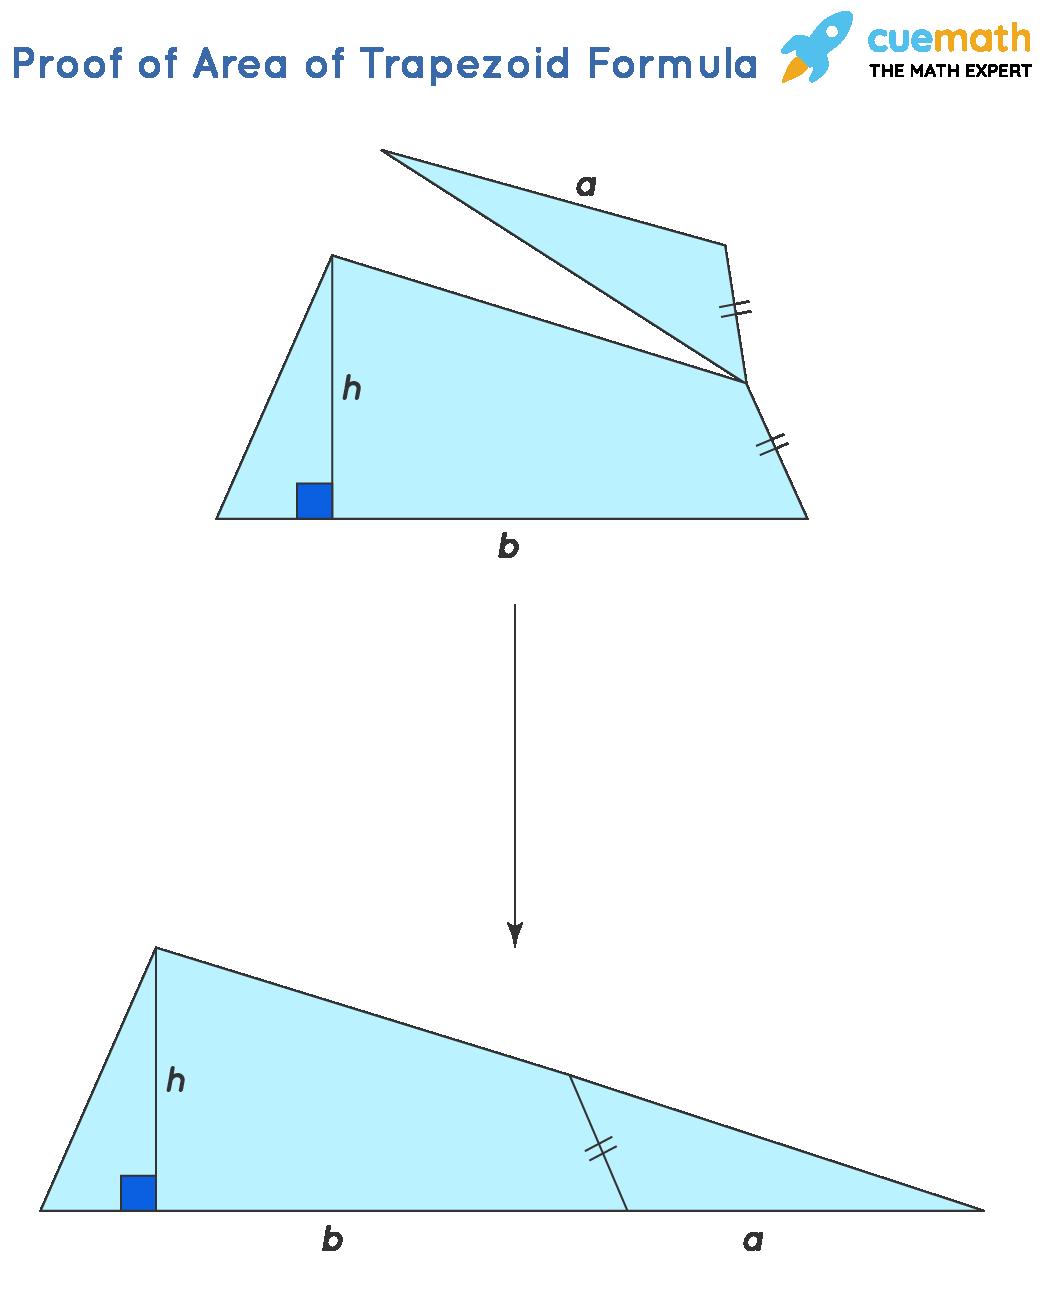 Proof of area of trapezoid formula